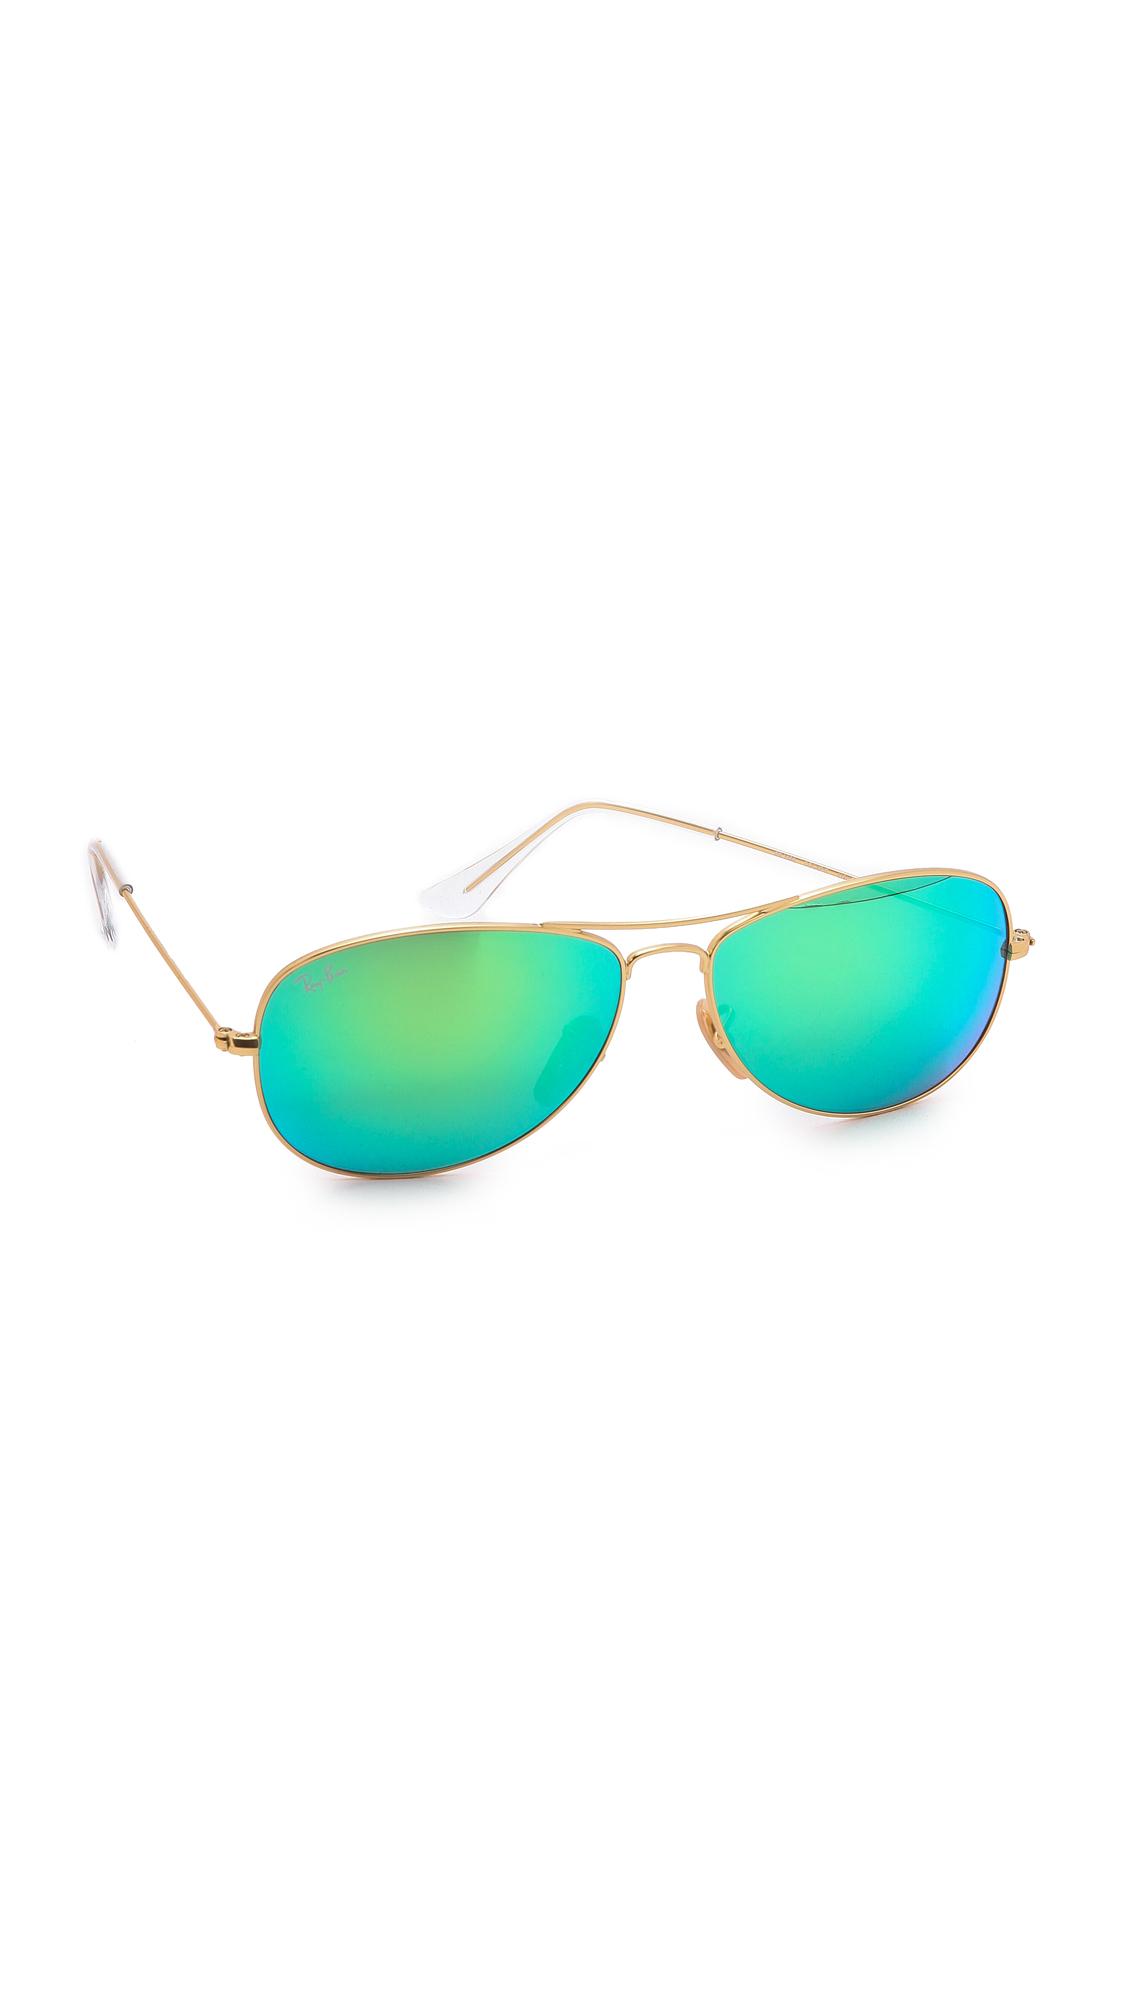 mirrored aviator sunglasses ray ban  Ray-Ban Mirrored Shrunken Aviator Sunglasses